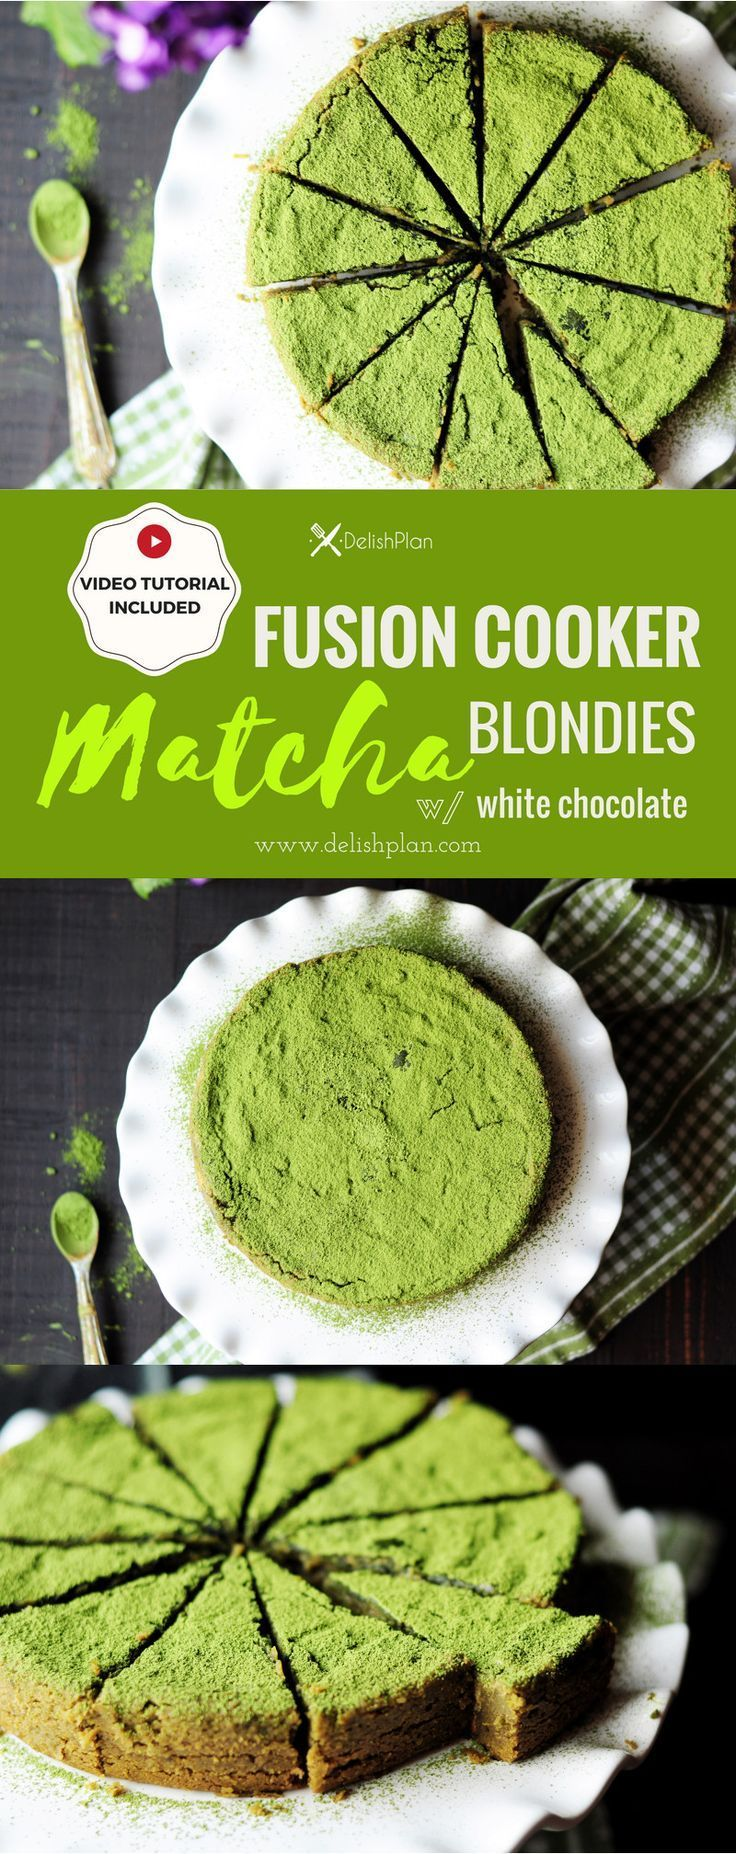 Gluten Free Matcha Blondie Recipe Fusion Cooker Oven Method Included Video Recipe Blondies Recipe Recipes Sugar Free Recipes Desserts